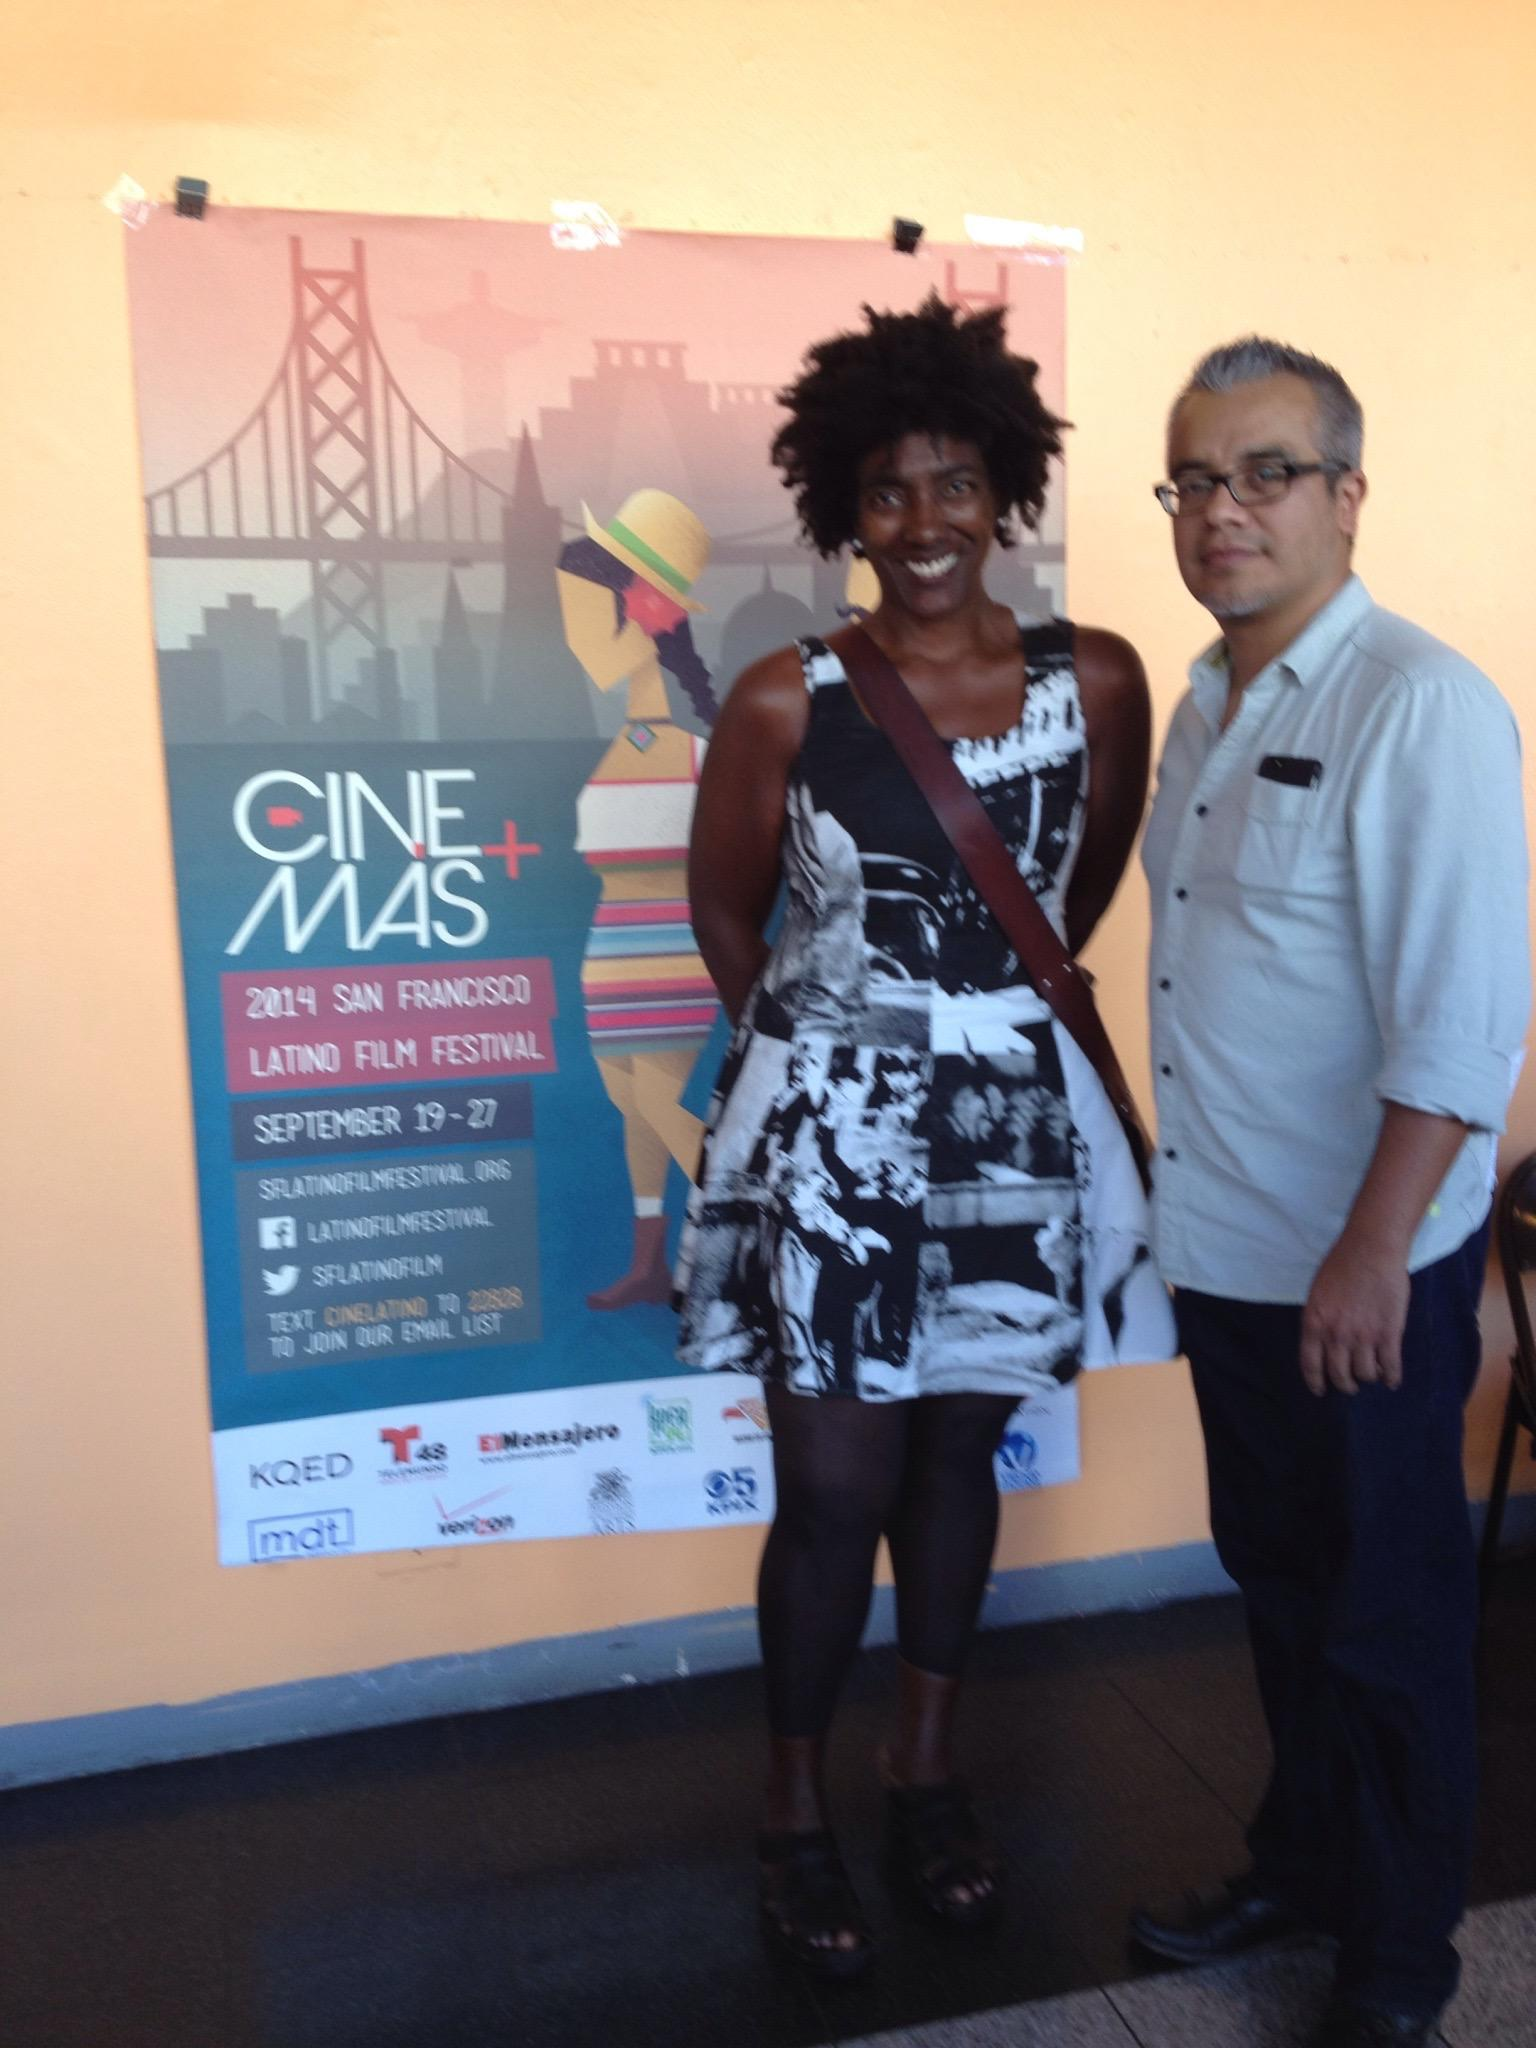 Cine+Mas San Francisco Latino Film Festival 2014